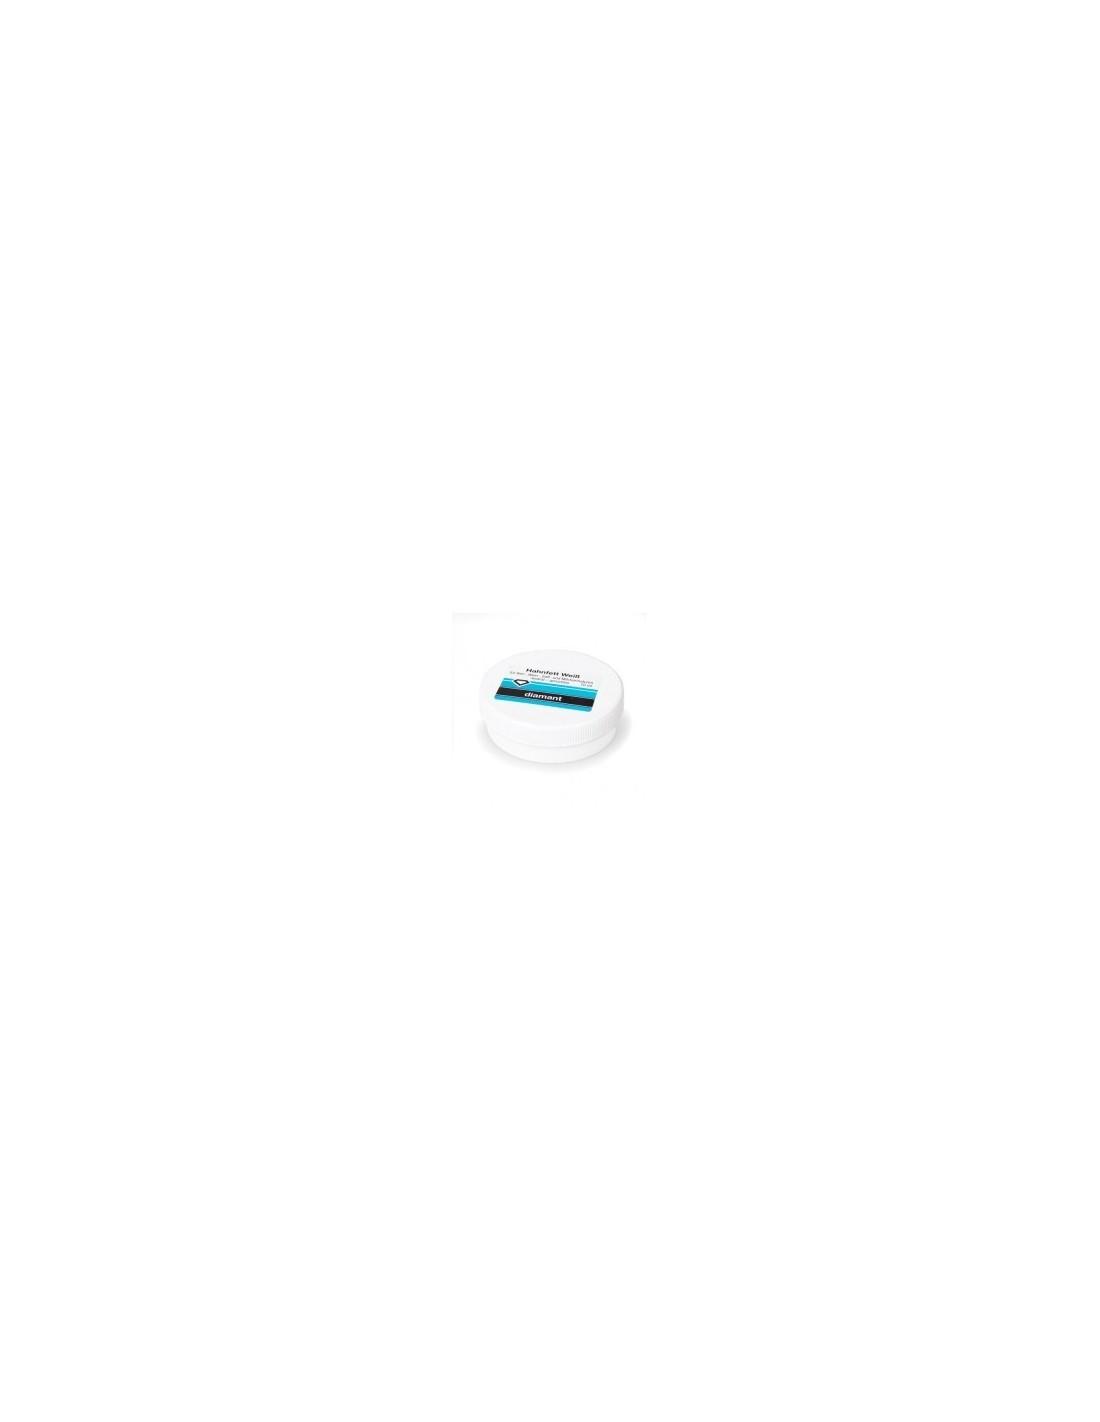 SAN01731 - Kranfett Diamant 70 ml